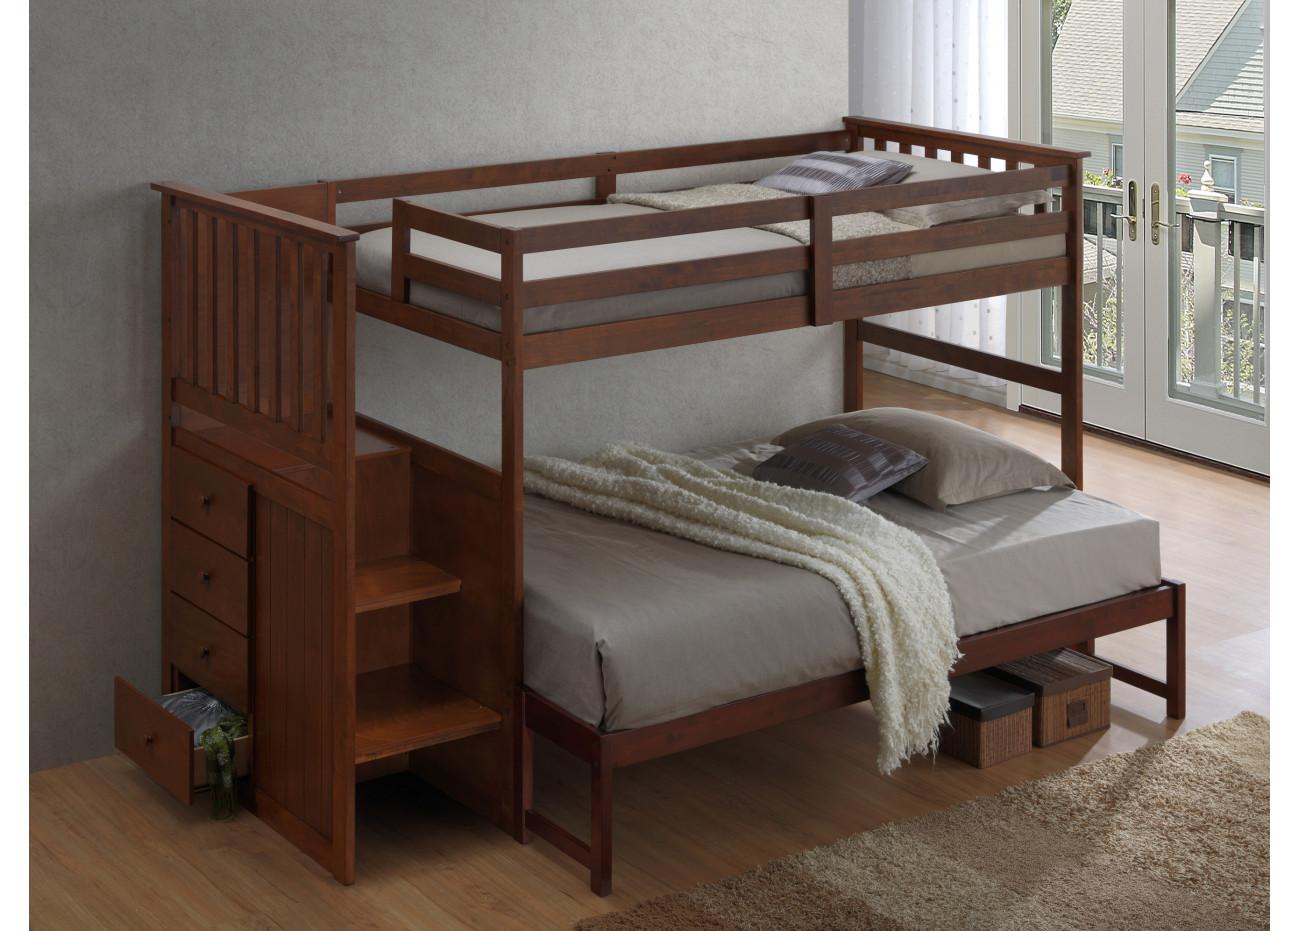 lit superpos simple double. Black Bedroom Furniture Sets. Home Design Ideas